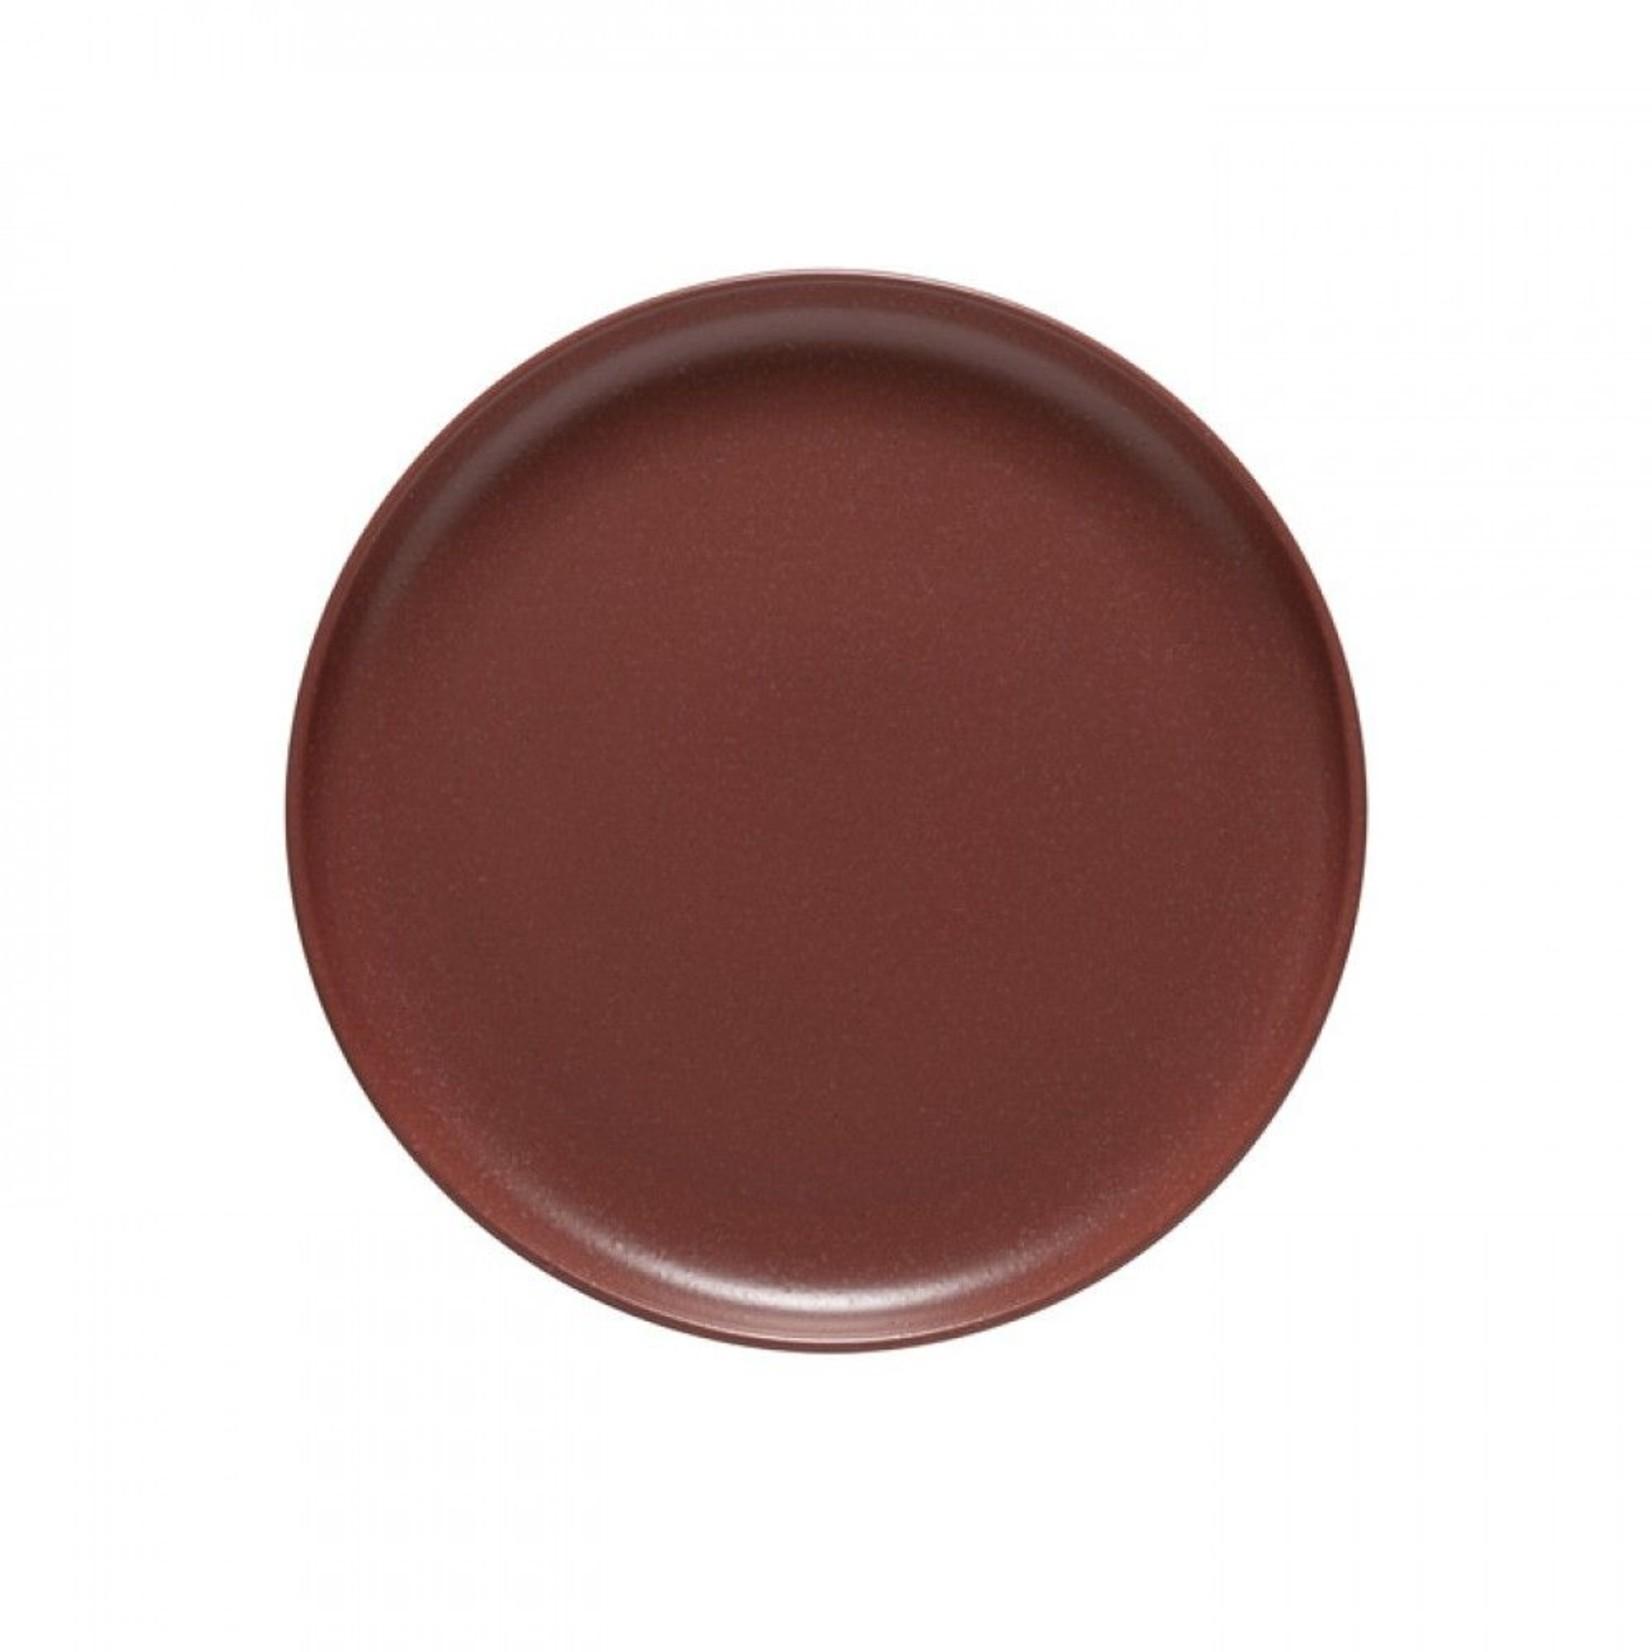 Casafina Pacifica Dinner Plate